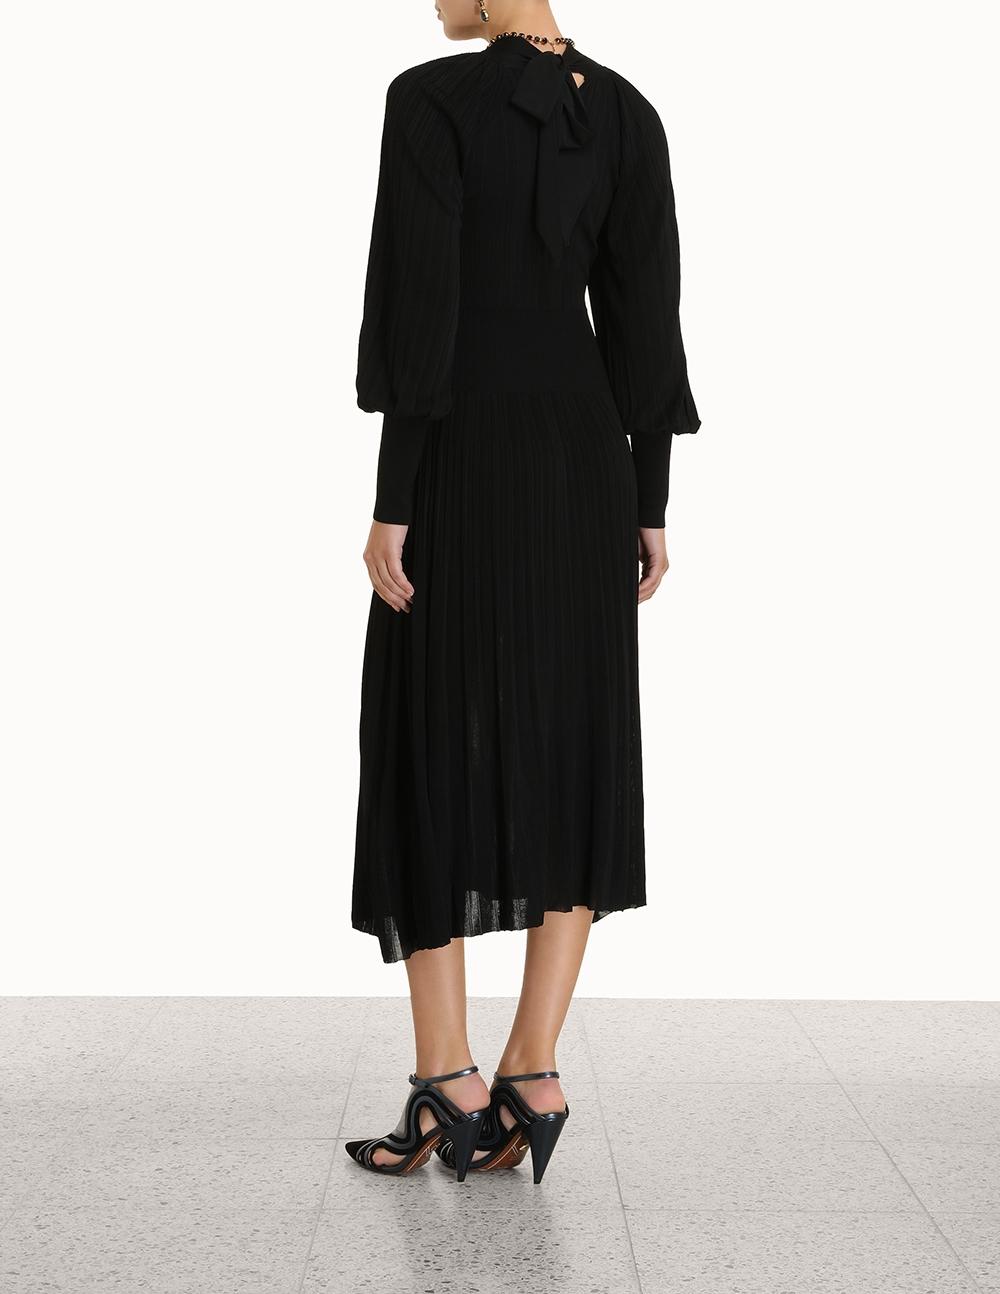 Long Sleeve Midi Dress